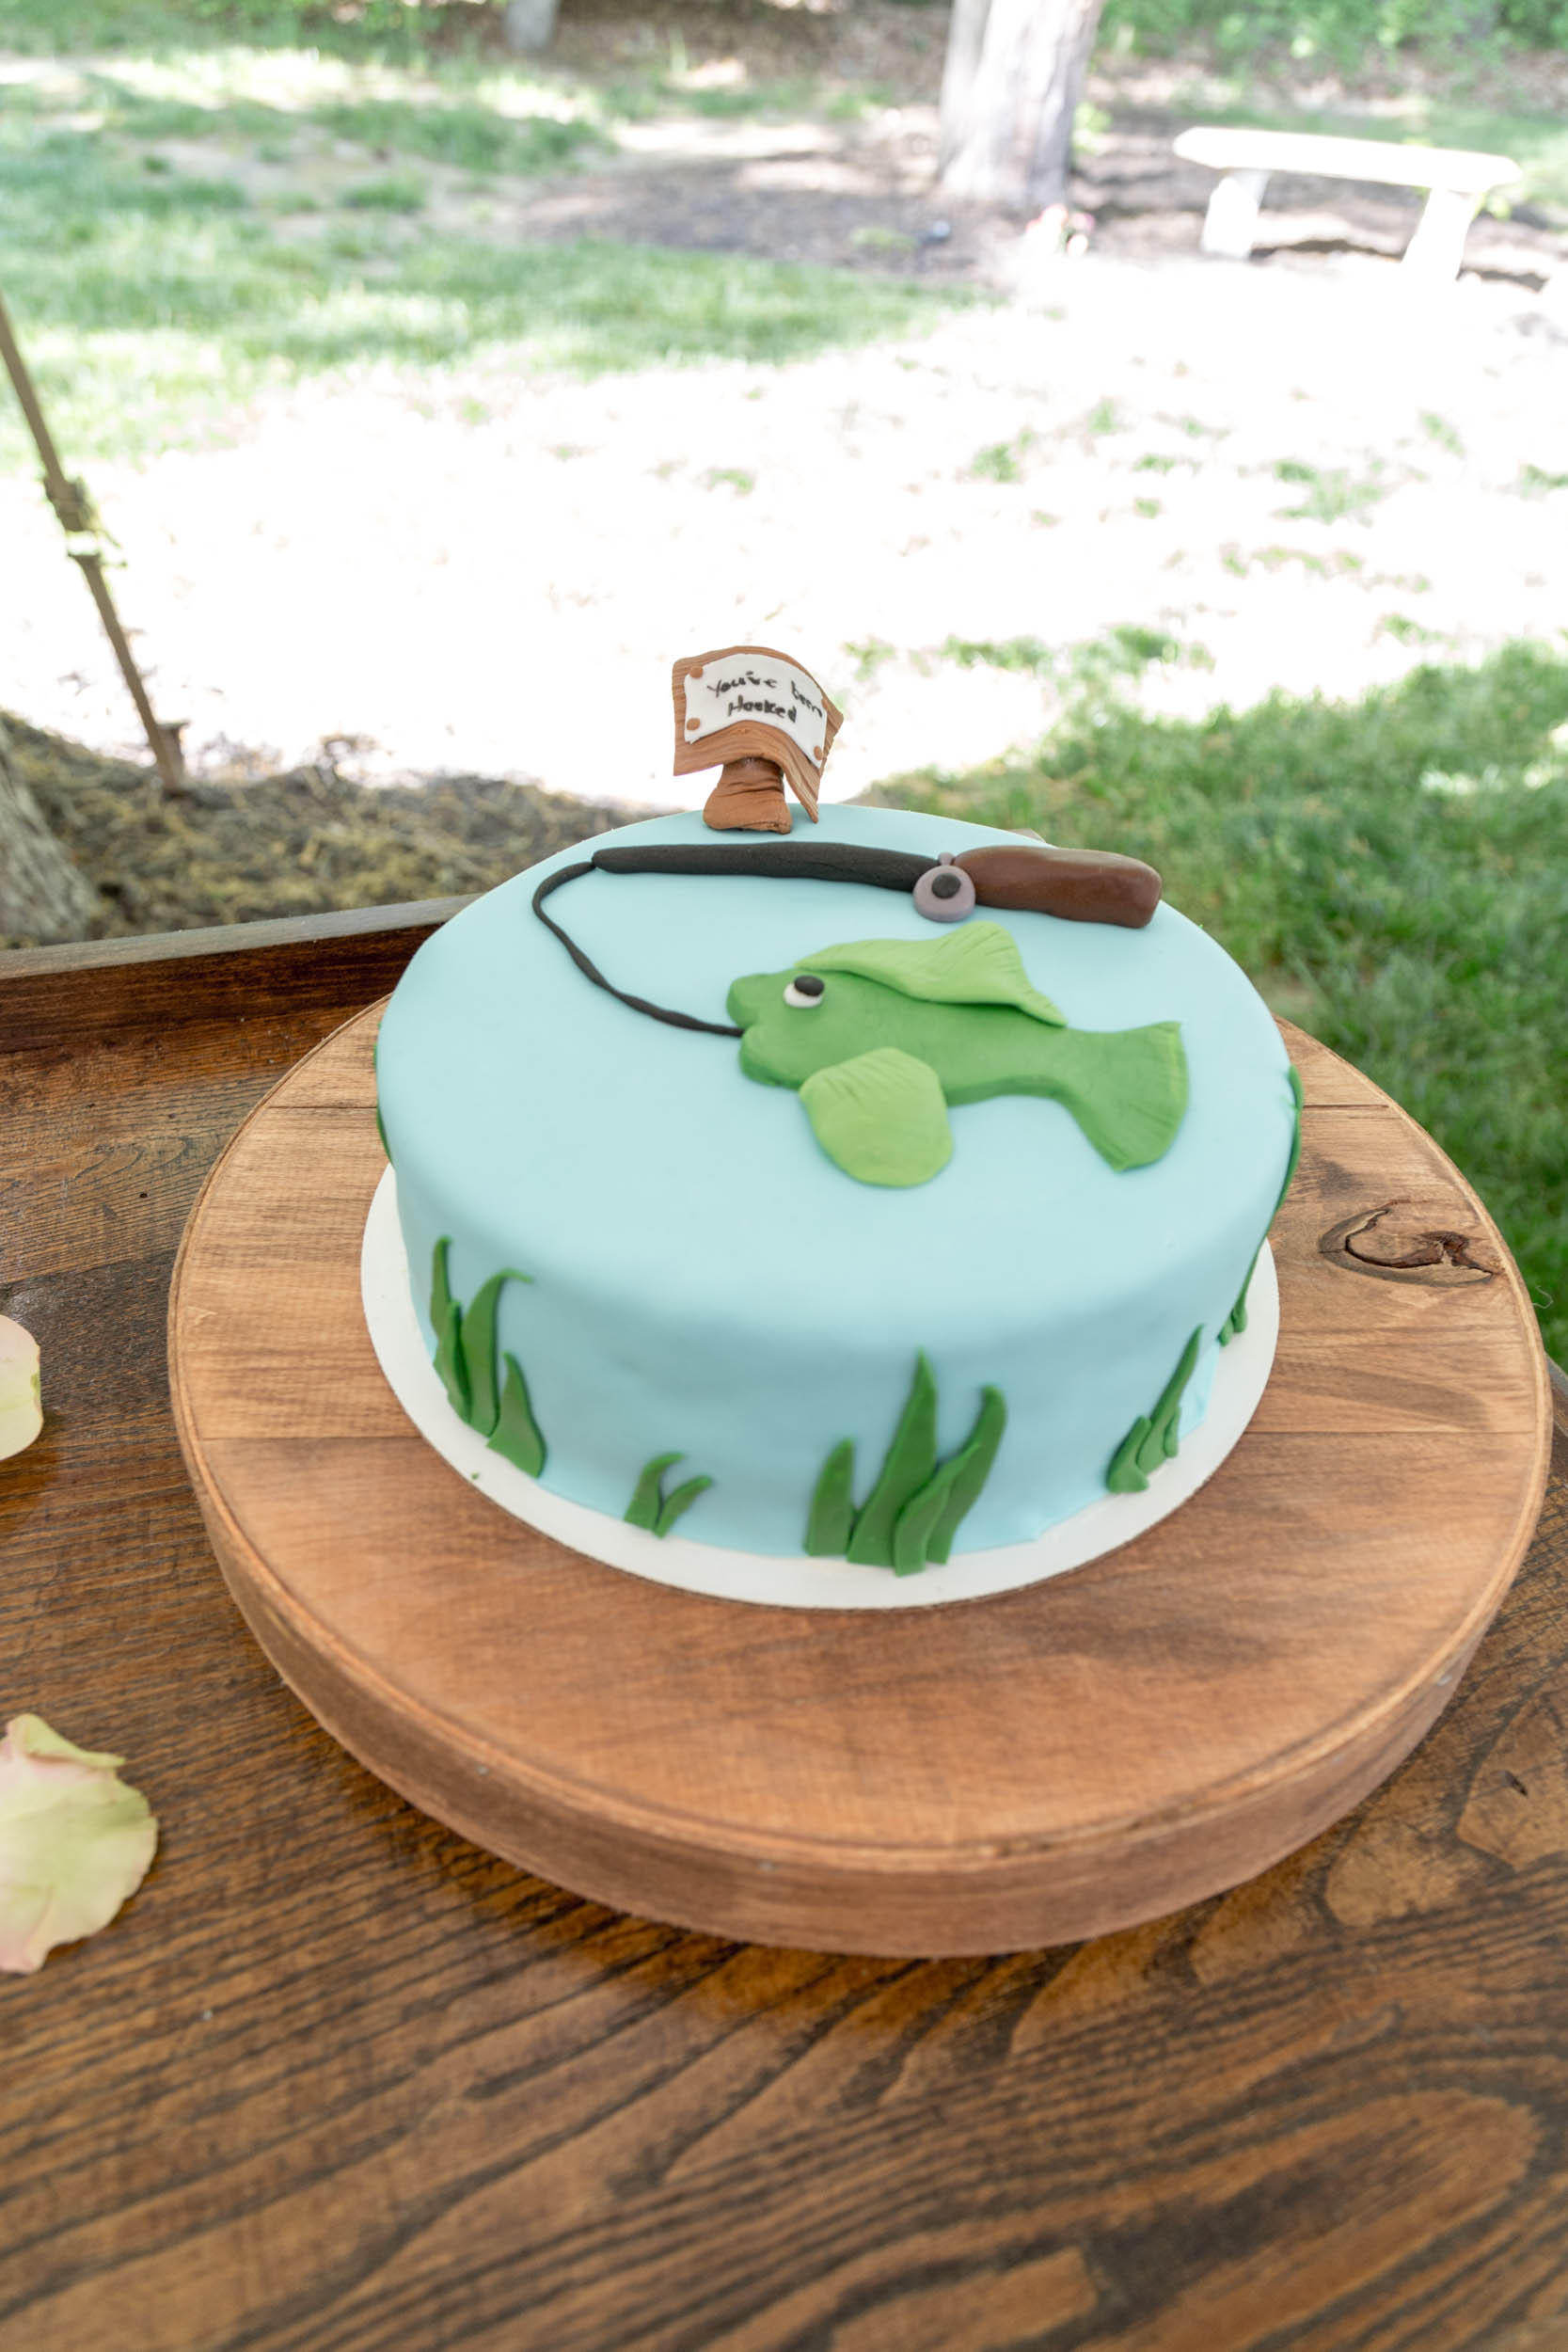 Goom's cake